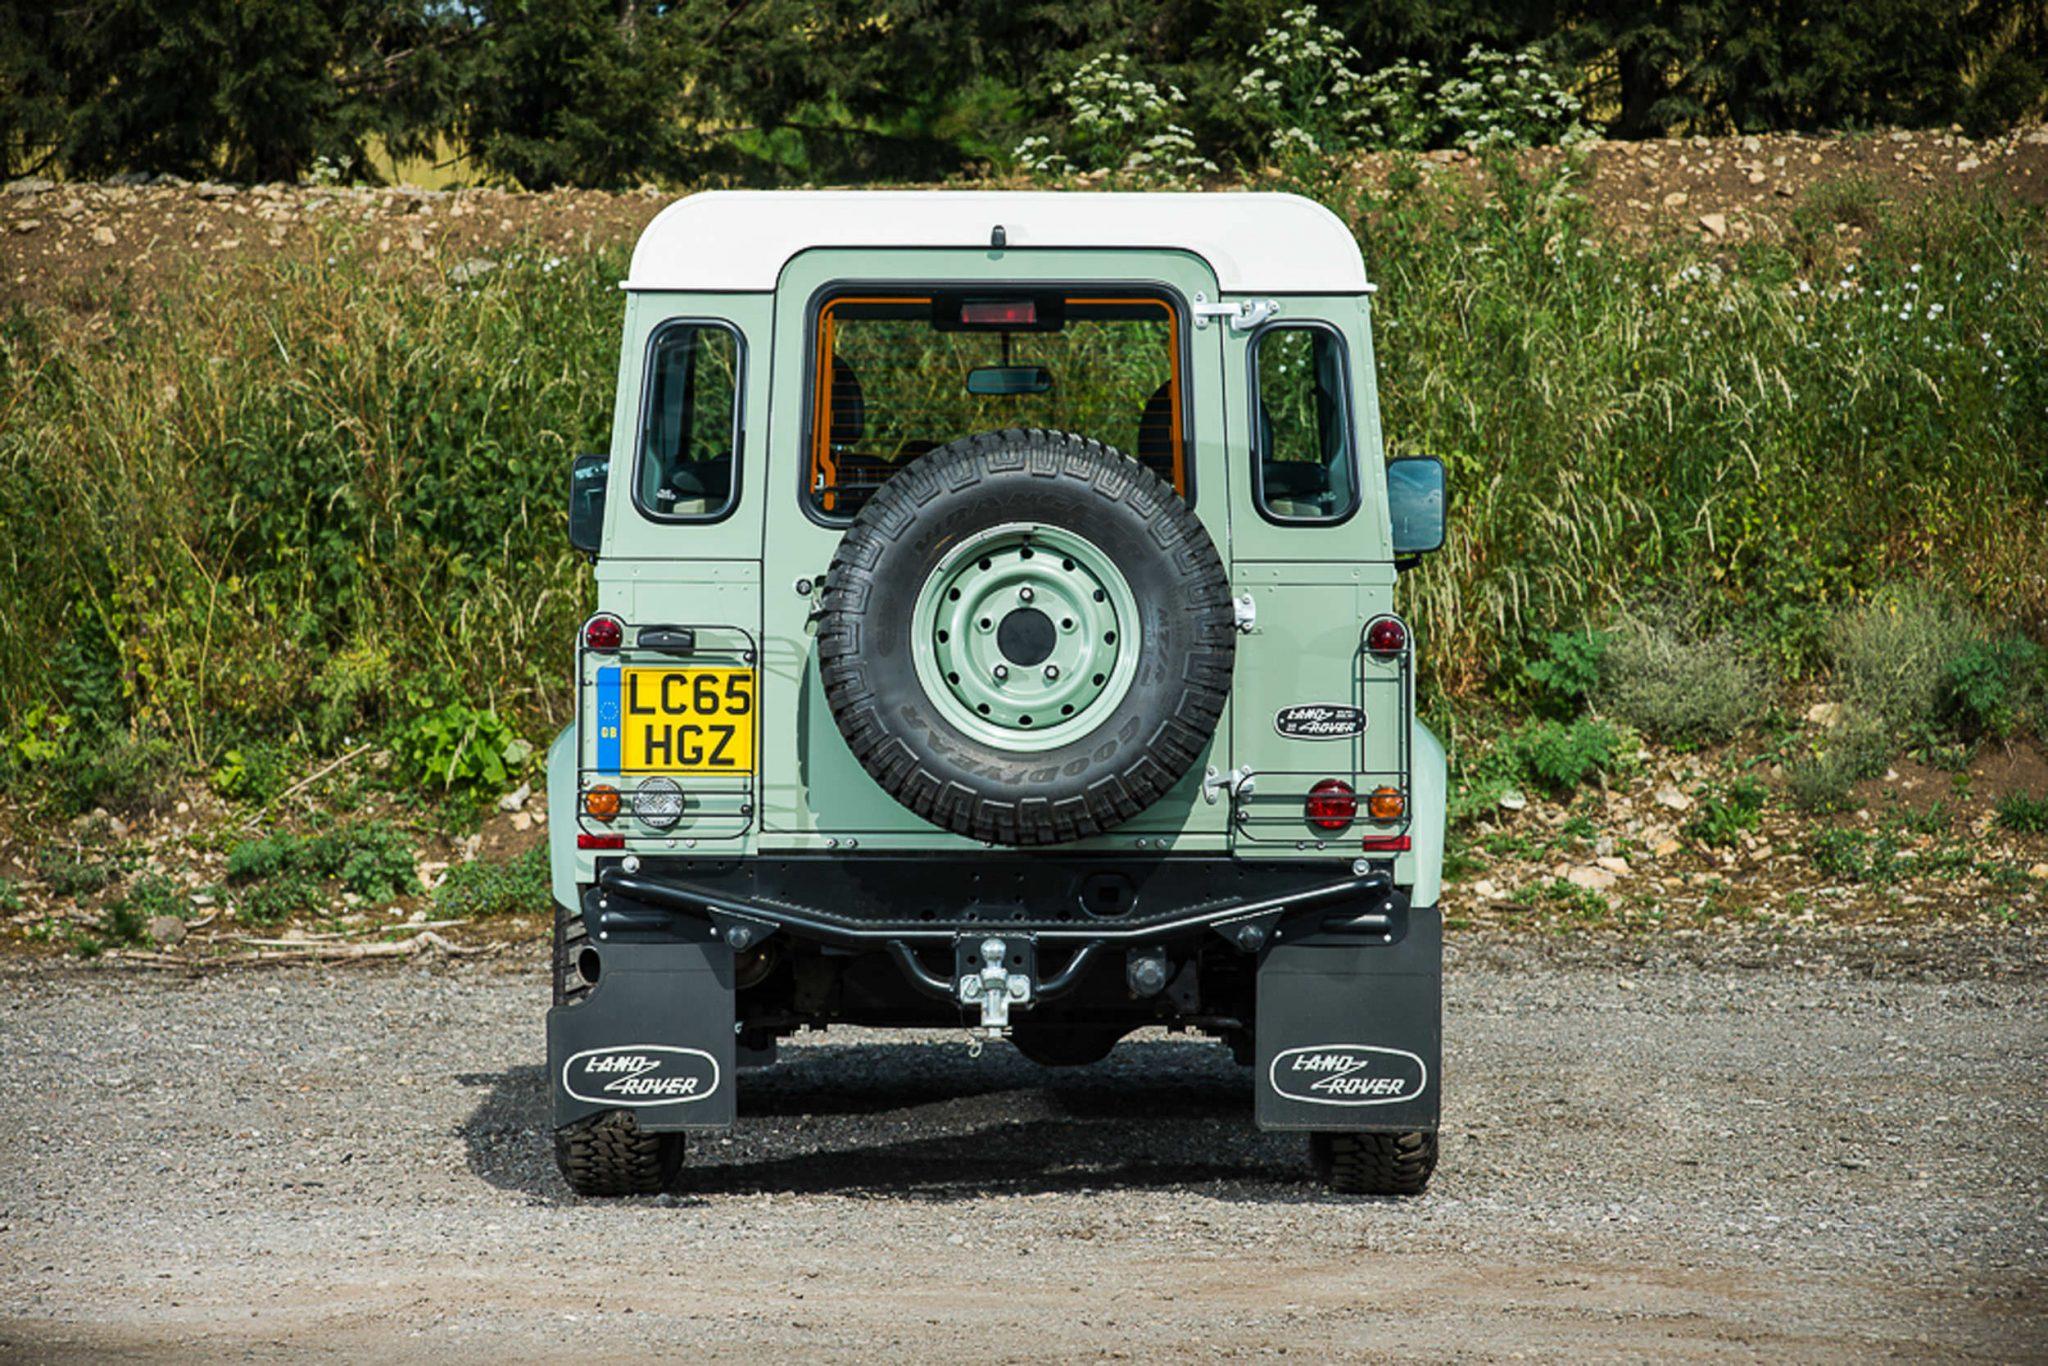 Rowan Atkinson's Land Rover Defender 13 - Rowan Atkinson's Land Rover Defender